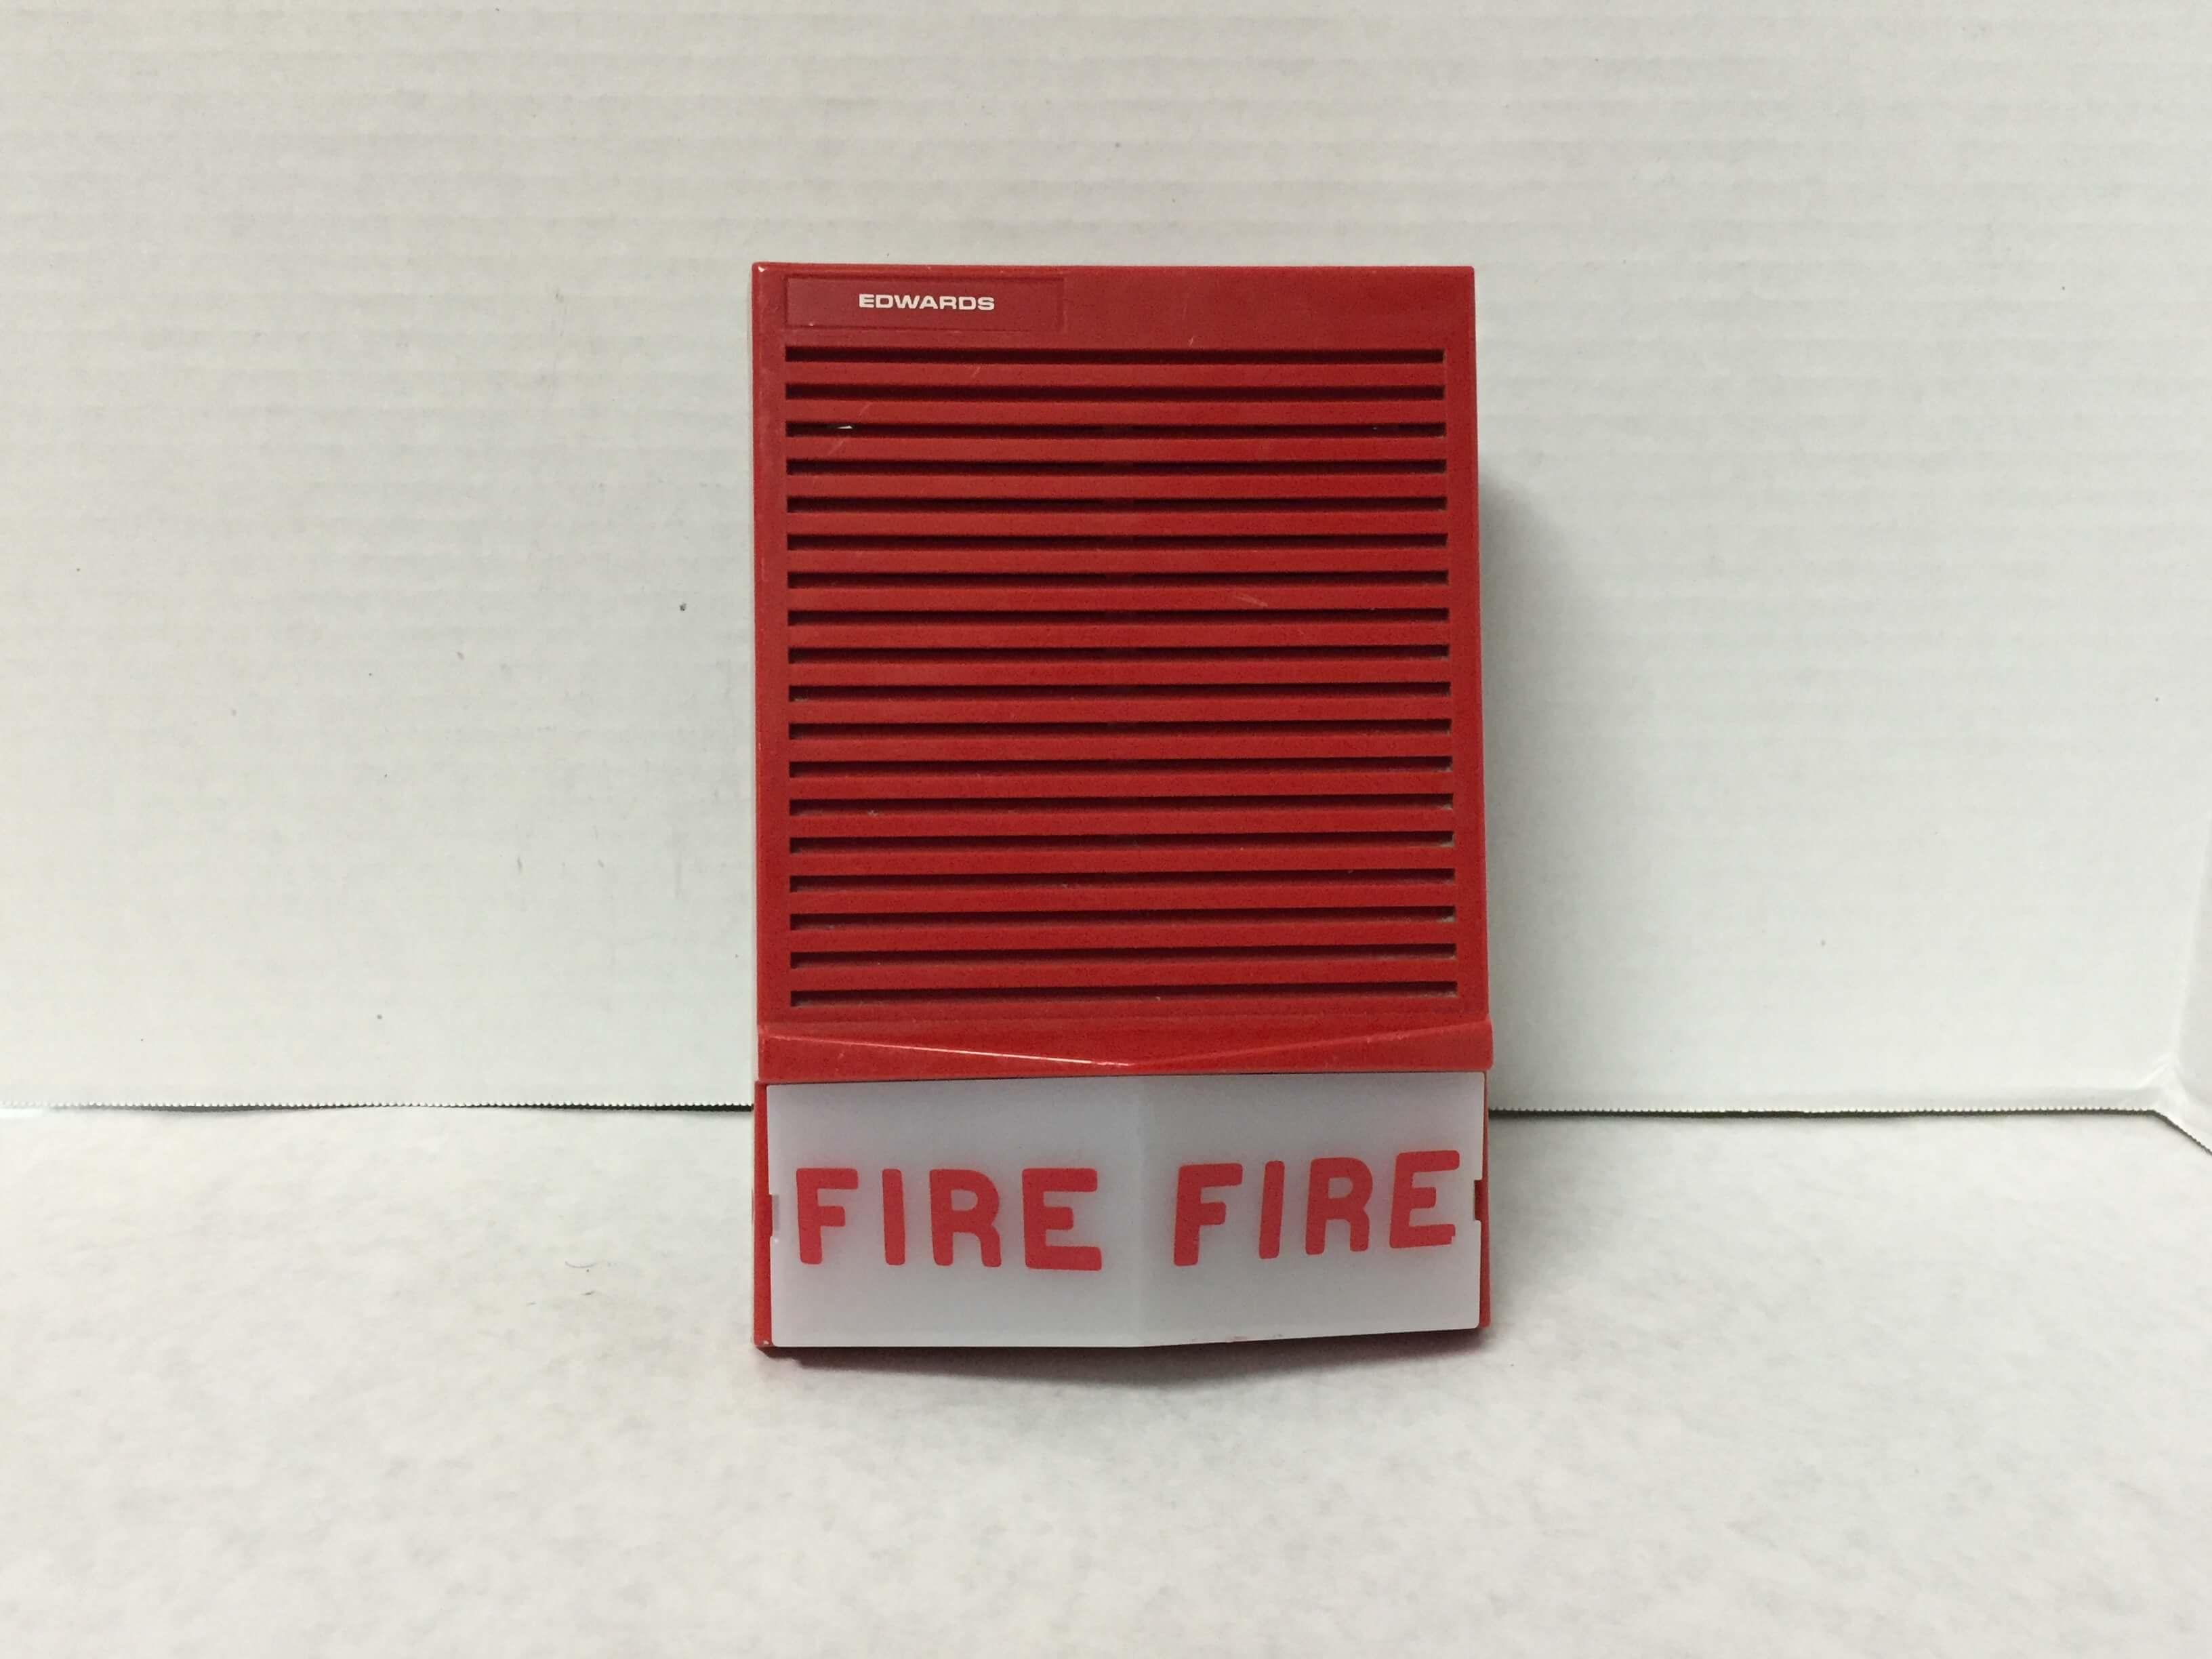 Edwards Fire Alarm Horn Sound